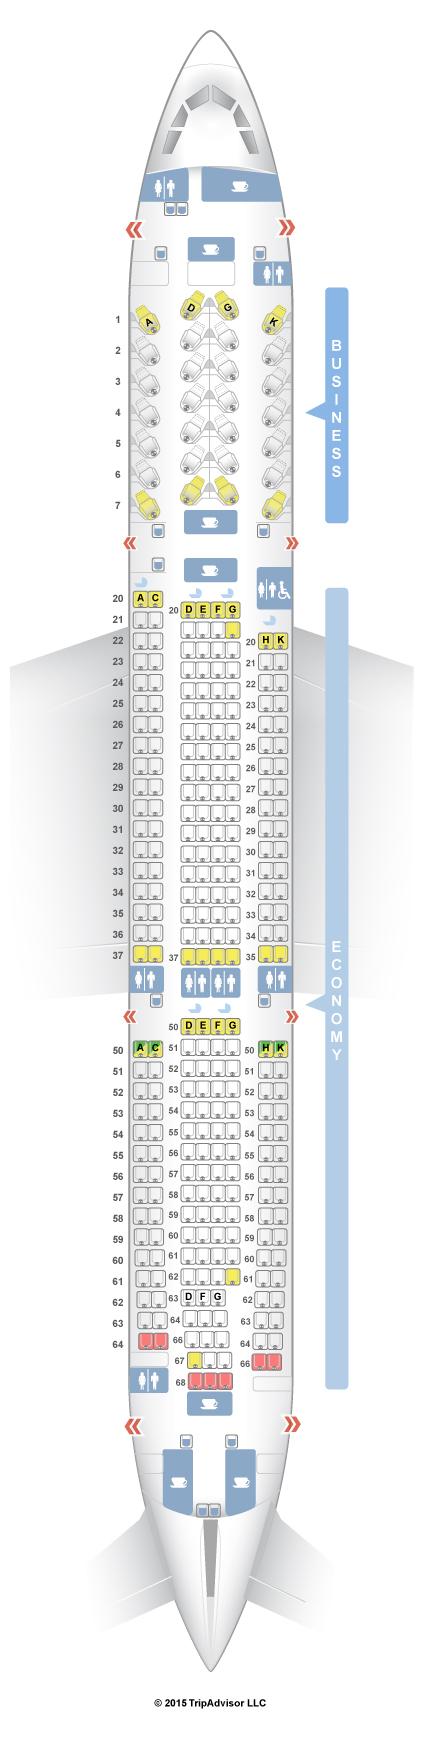 SeatGuru Seat Map SriLankan Airlines - SeatGuru